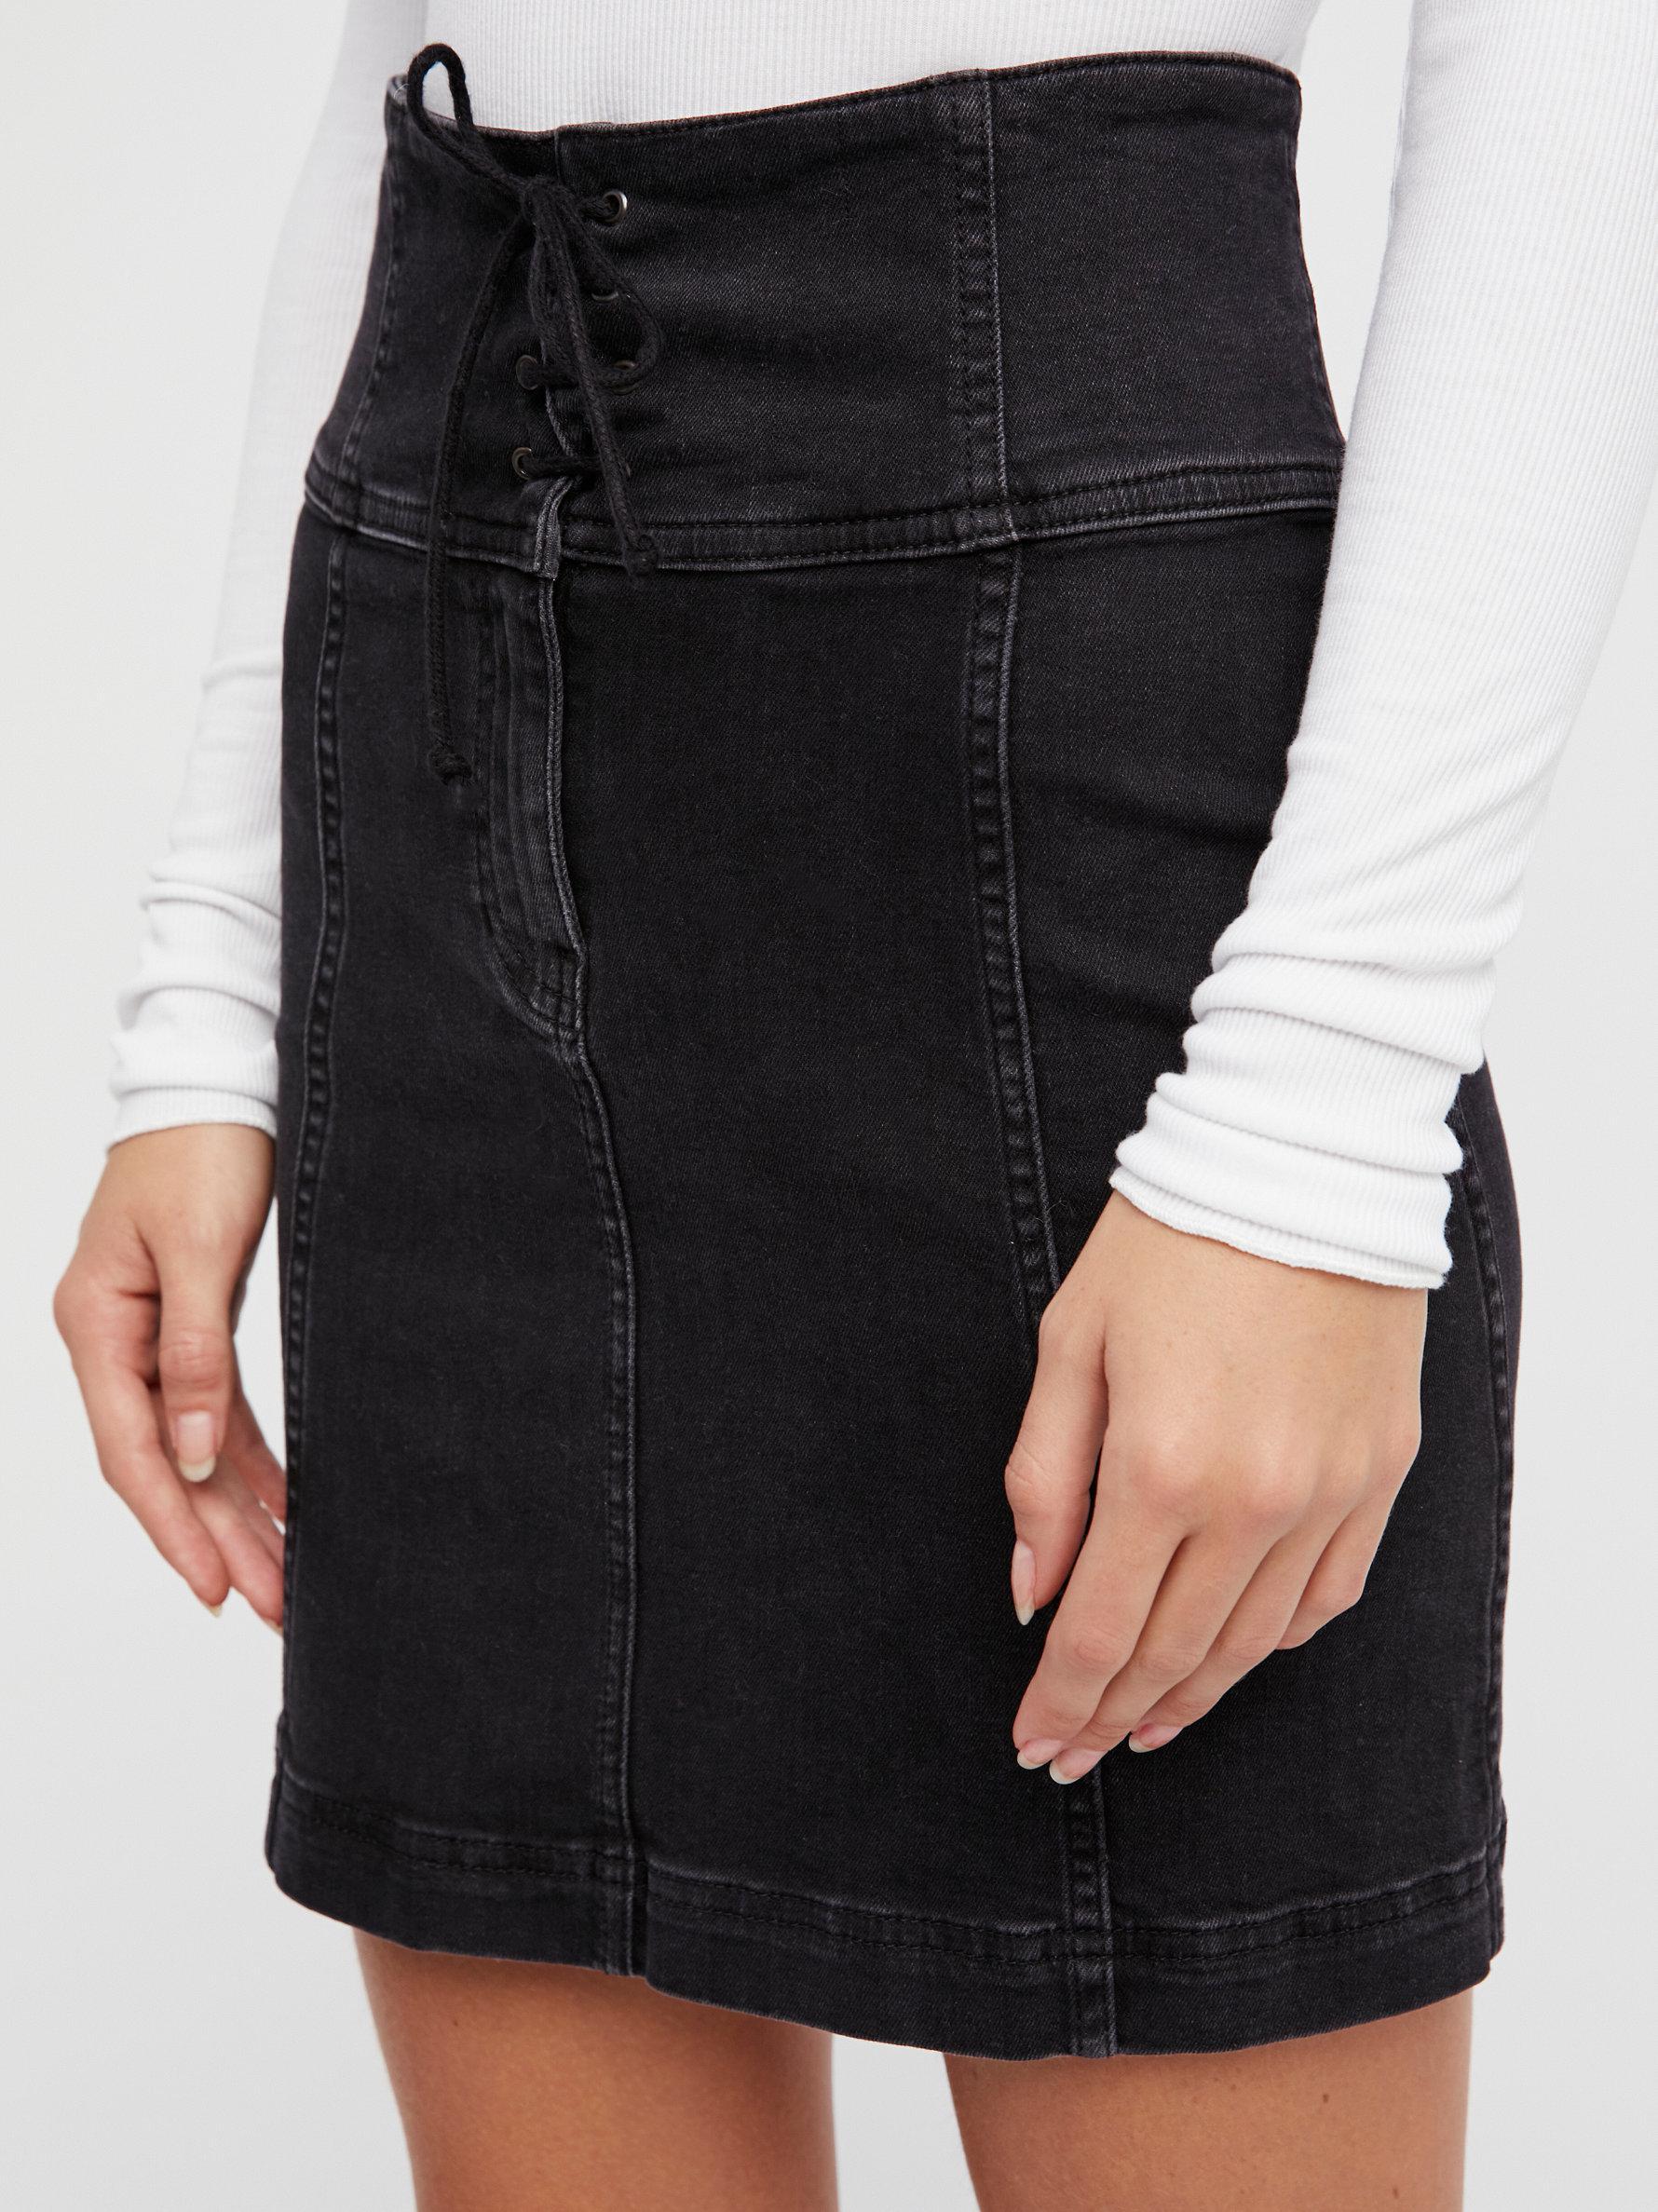 2693d4a6488 Lyst - Free People Modern Femme Corset Mini Skirt in Black